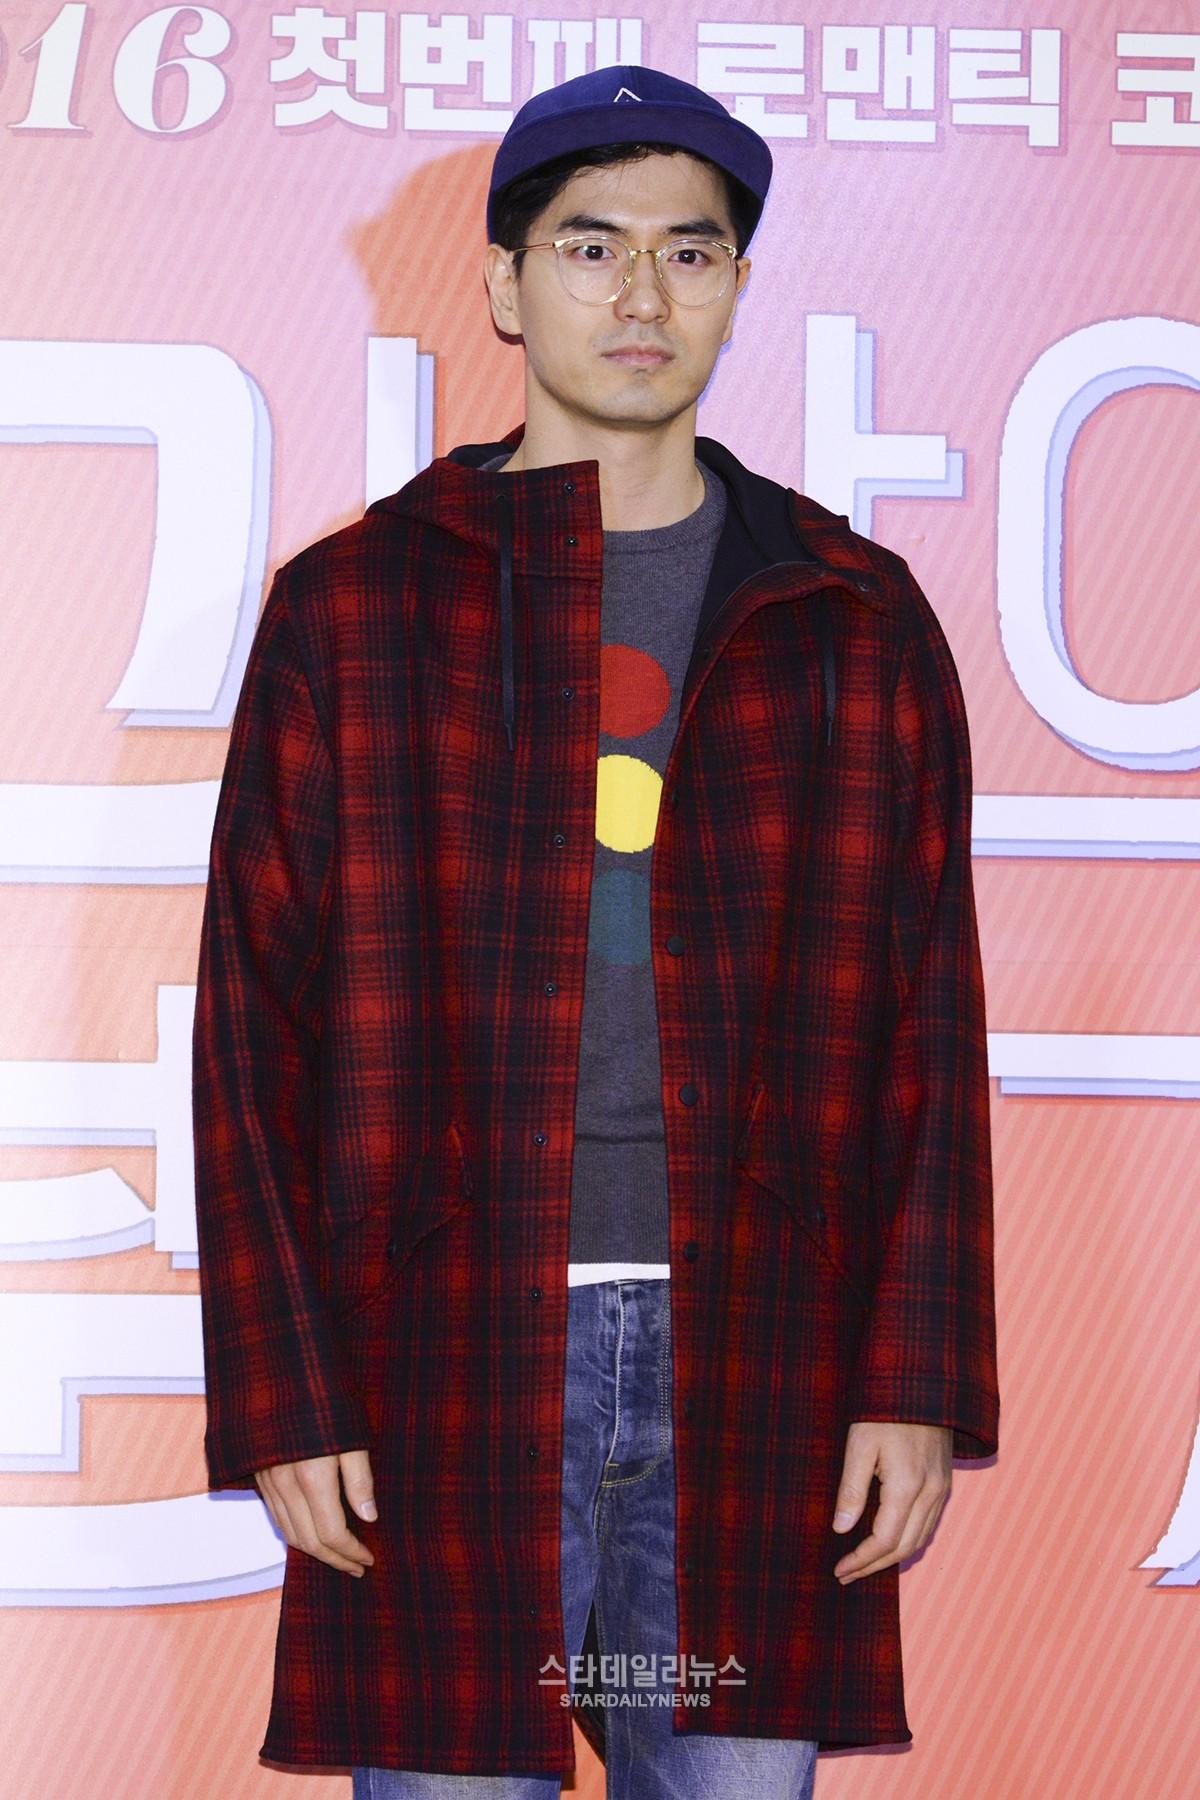 Second Arrest Warrant Request For Lee Jin Wook's Accuser Denied